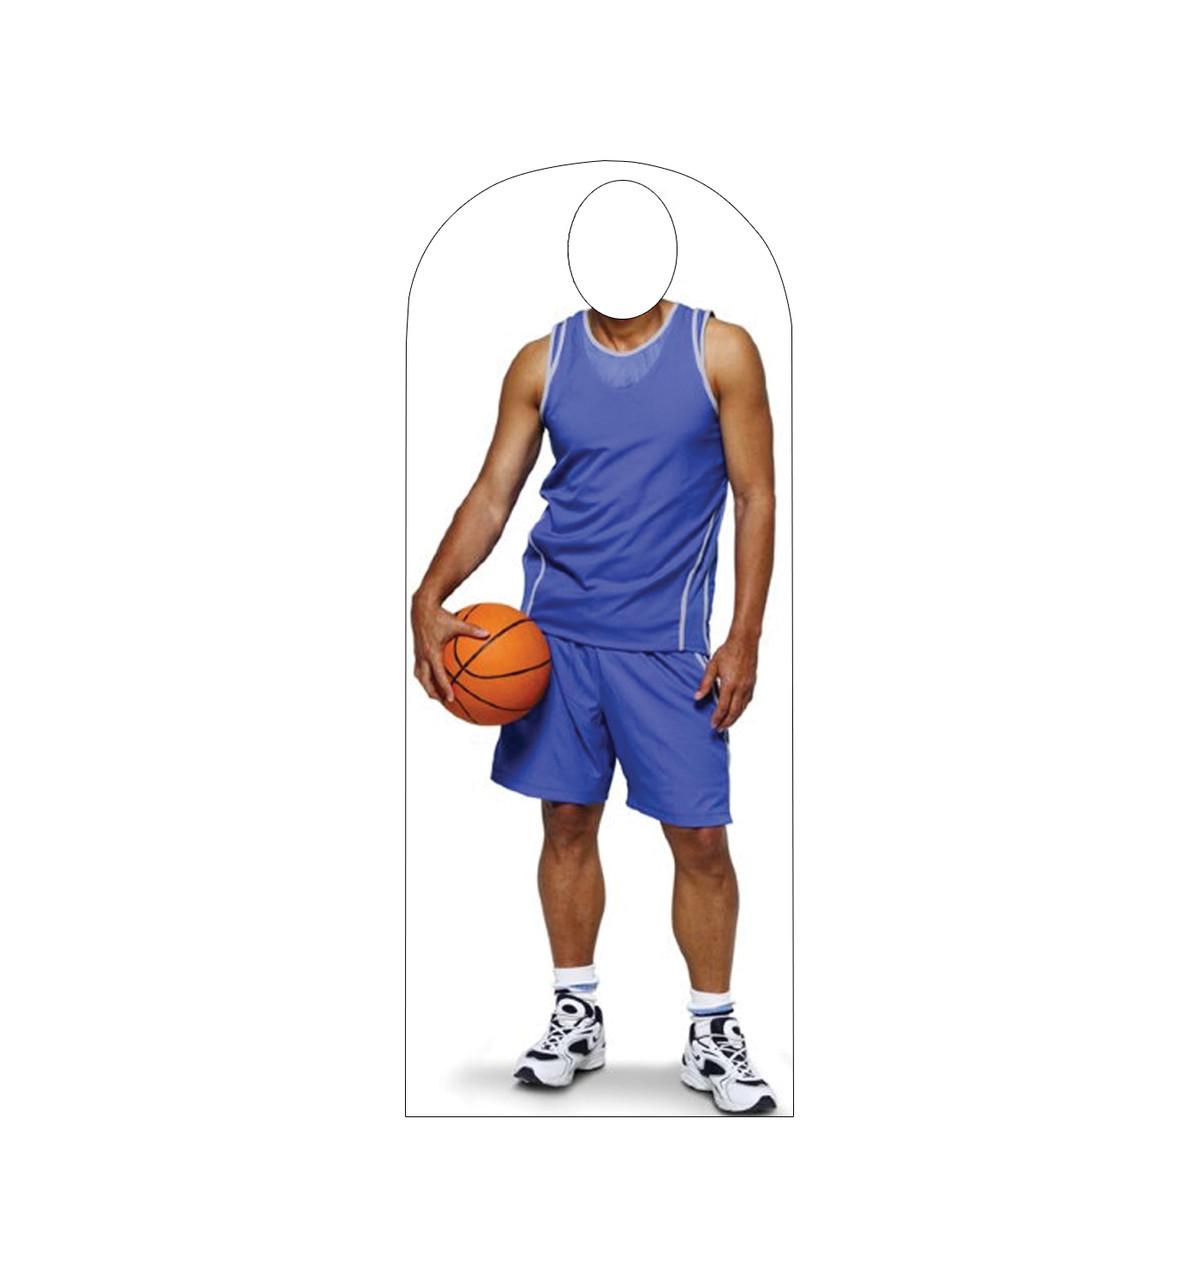 Life-size Basketball Standin Cardboard Standup